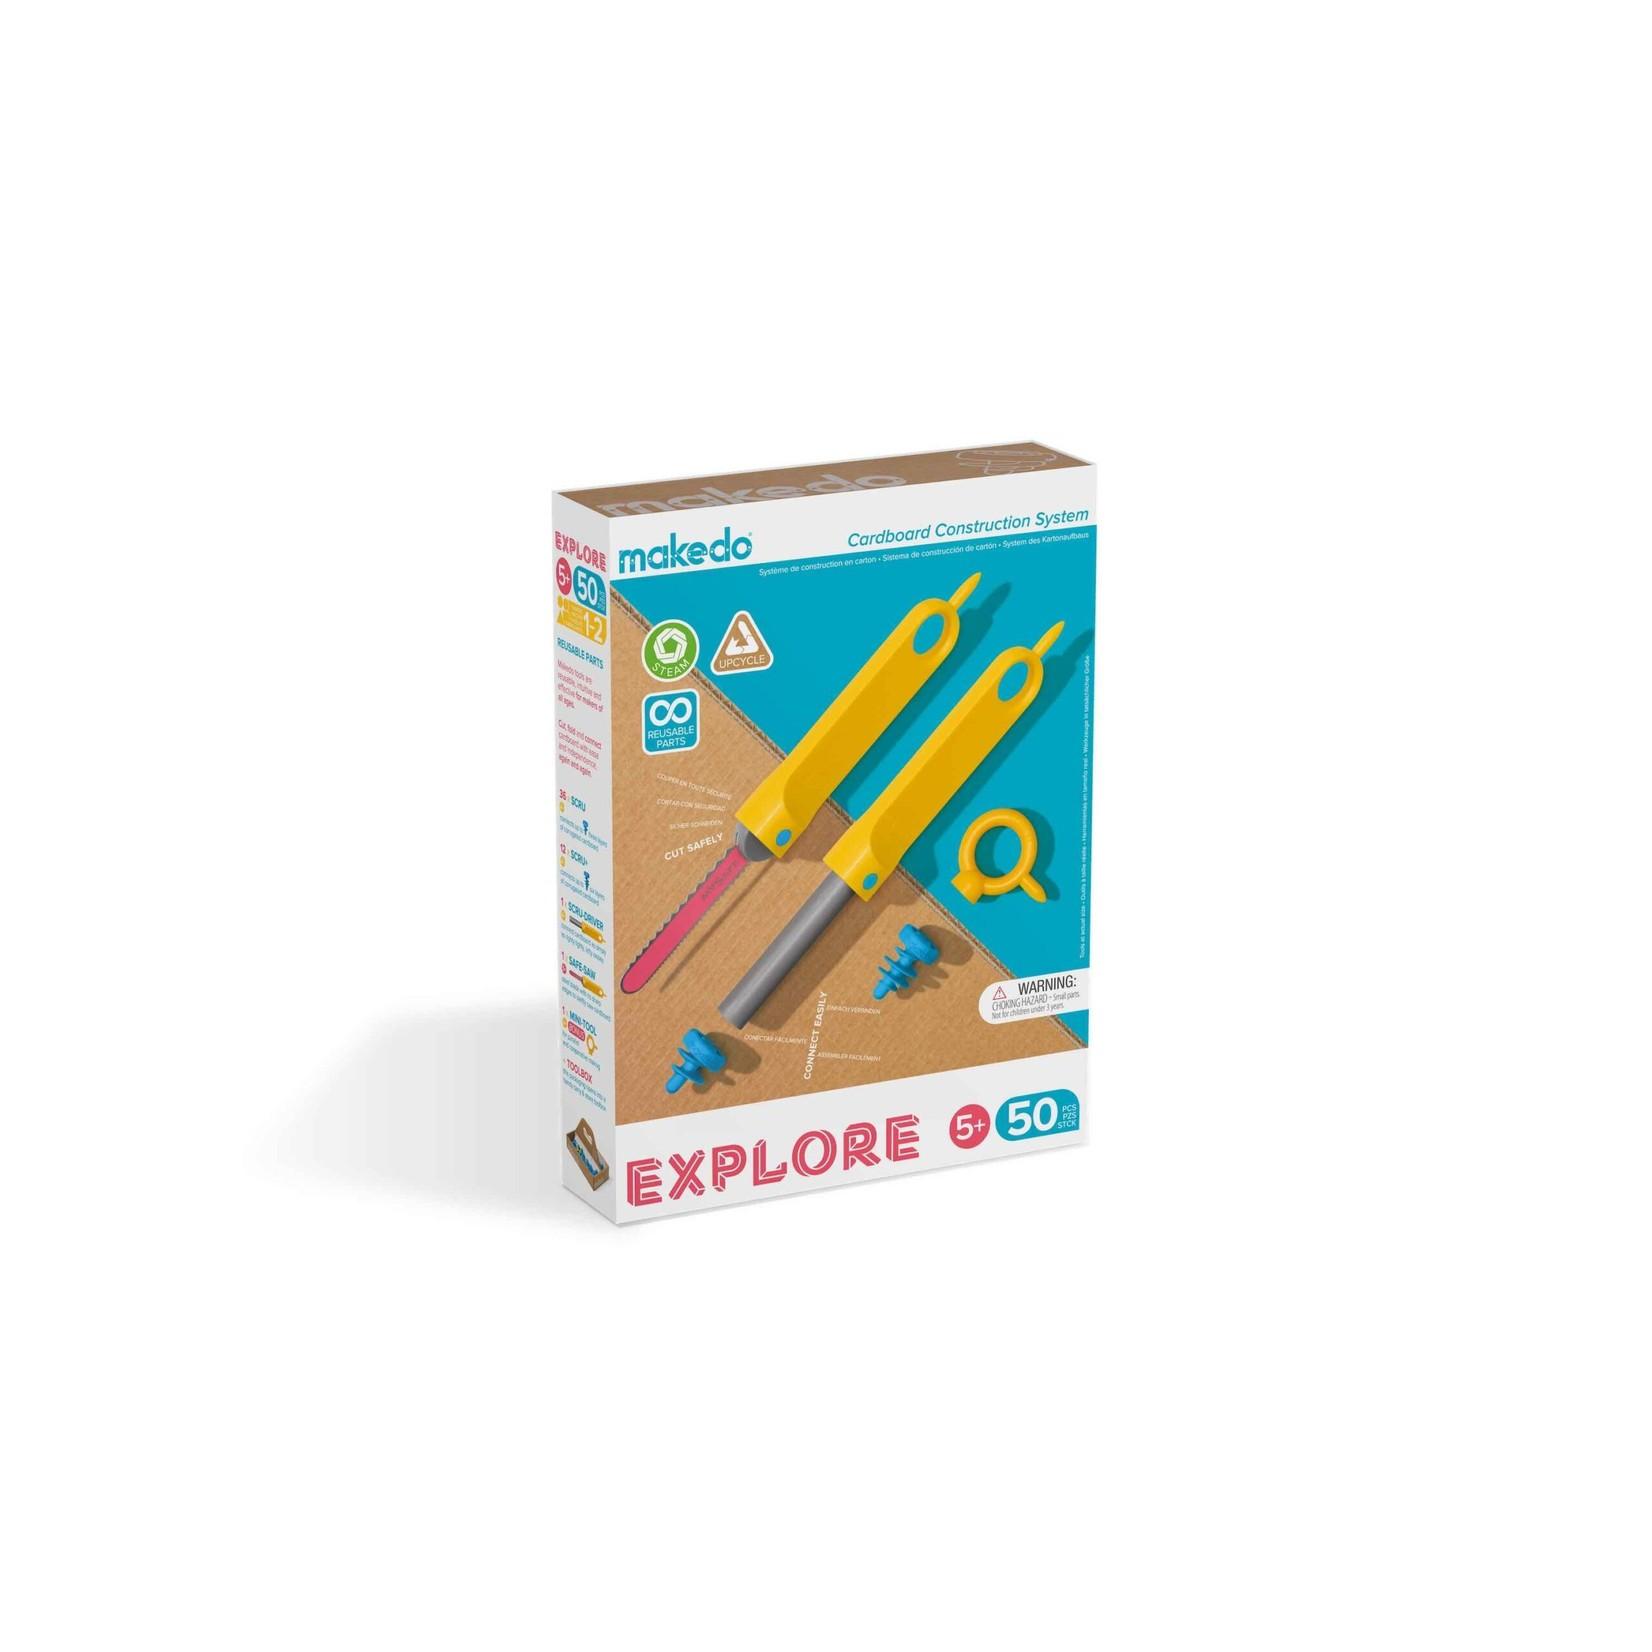 makedo Explore set 5+